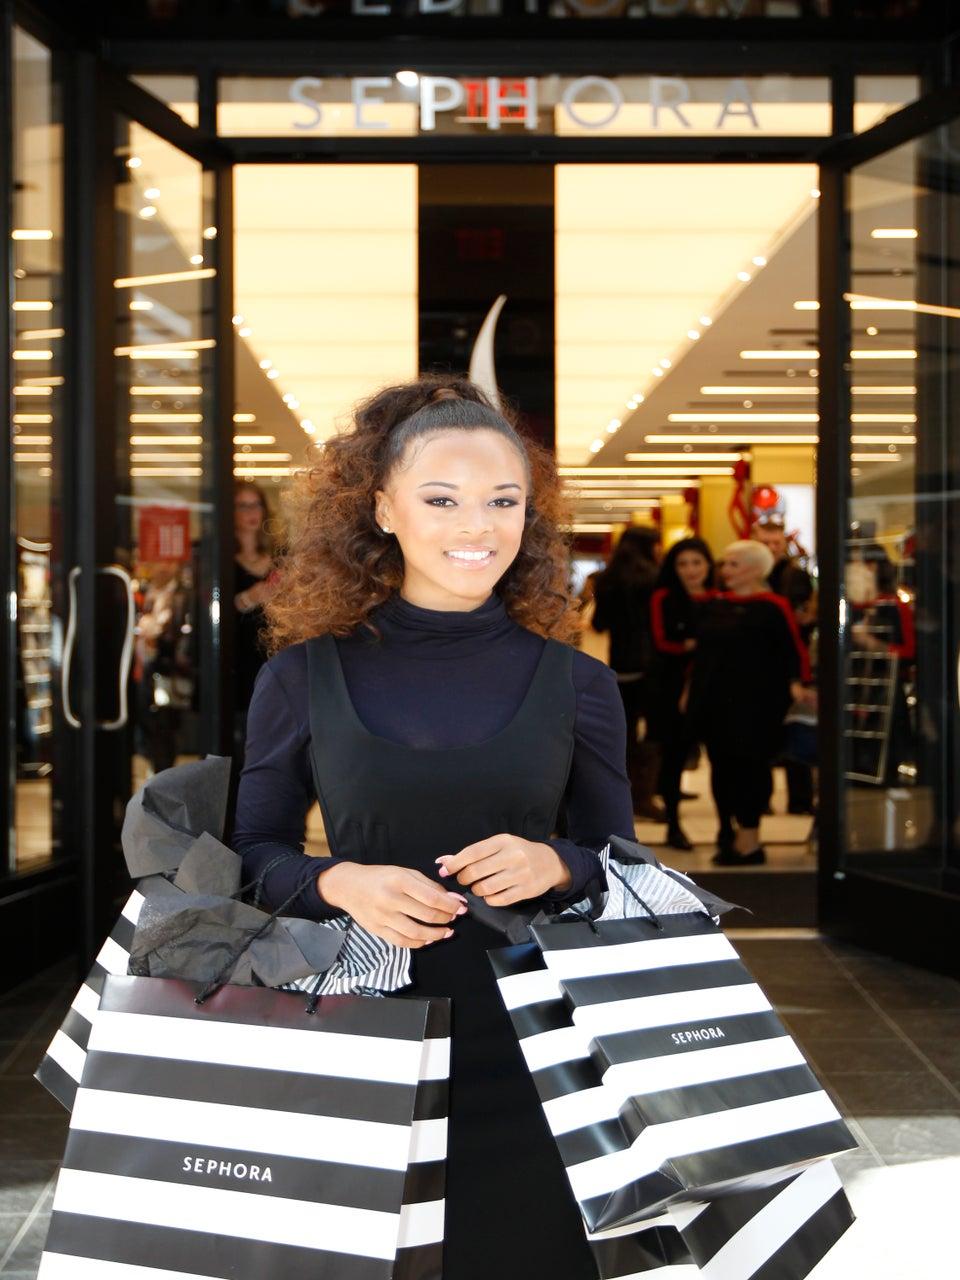 Sephora Helps Curly Girls Find Their Favorites